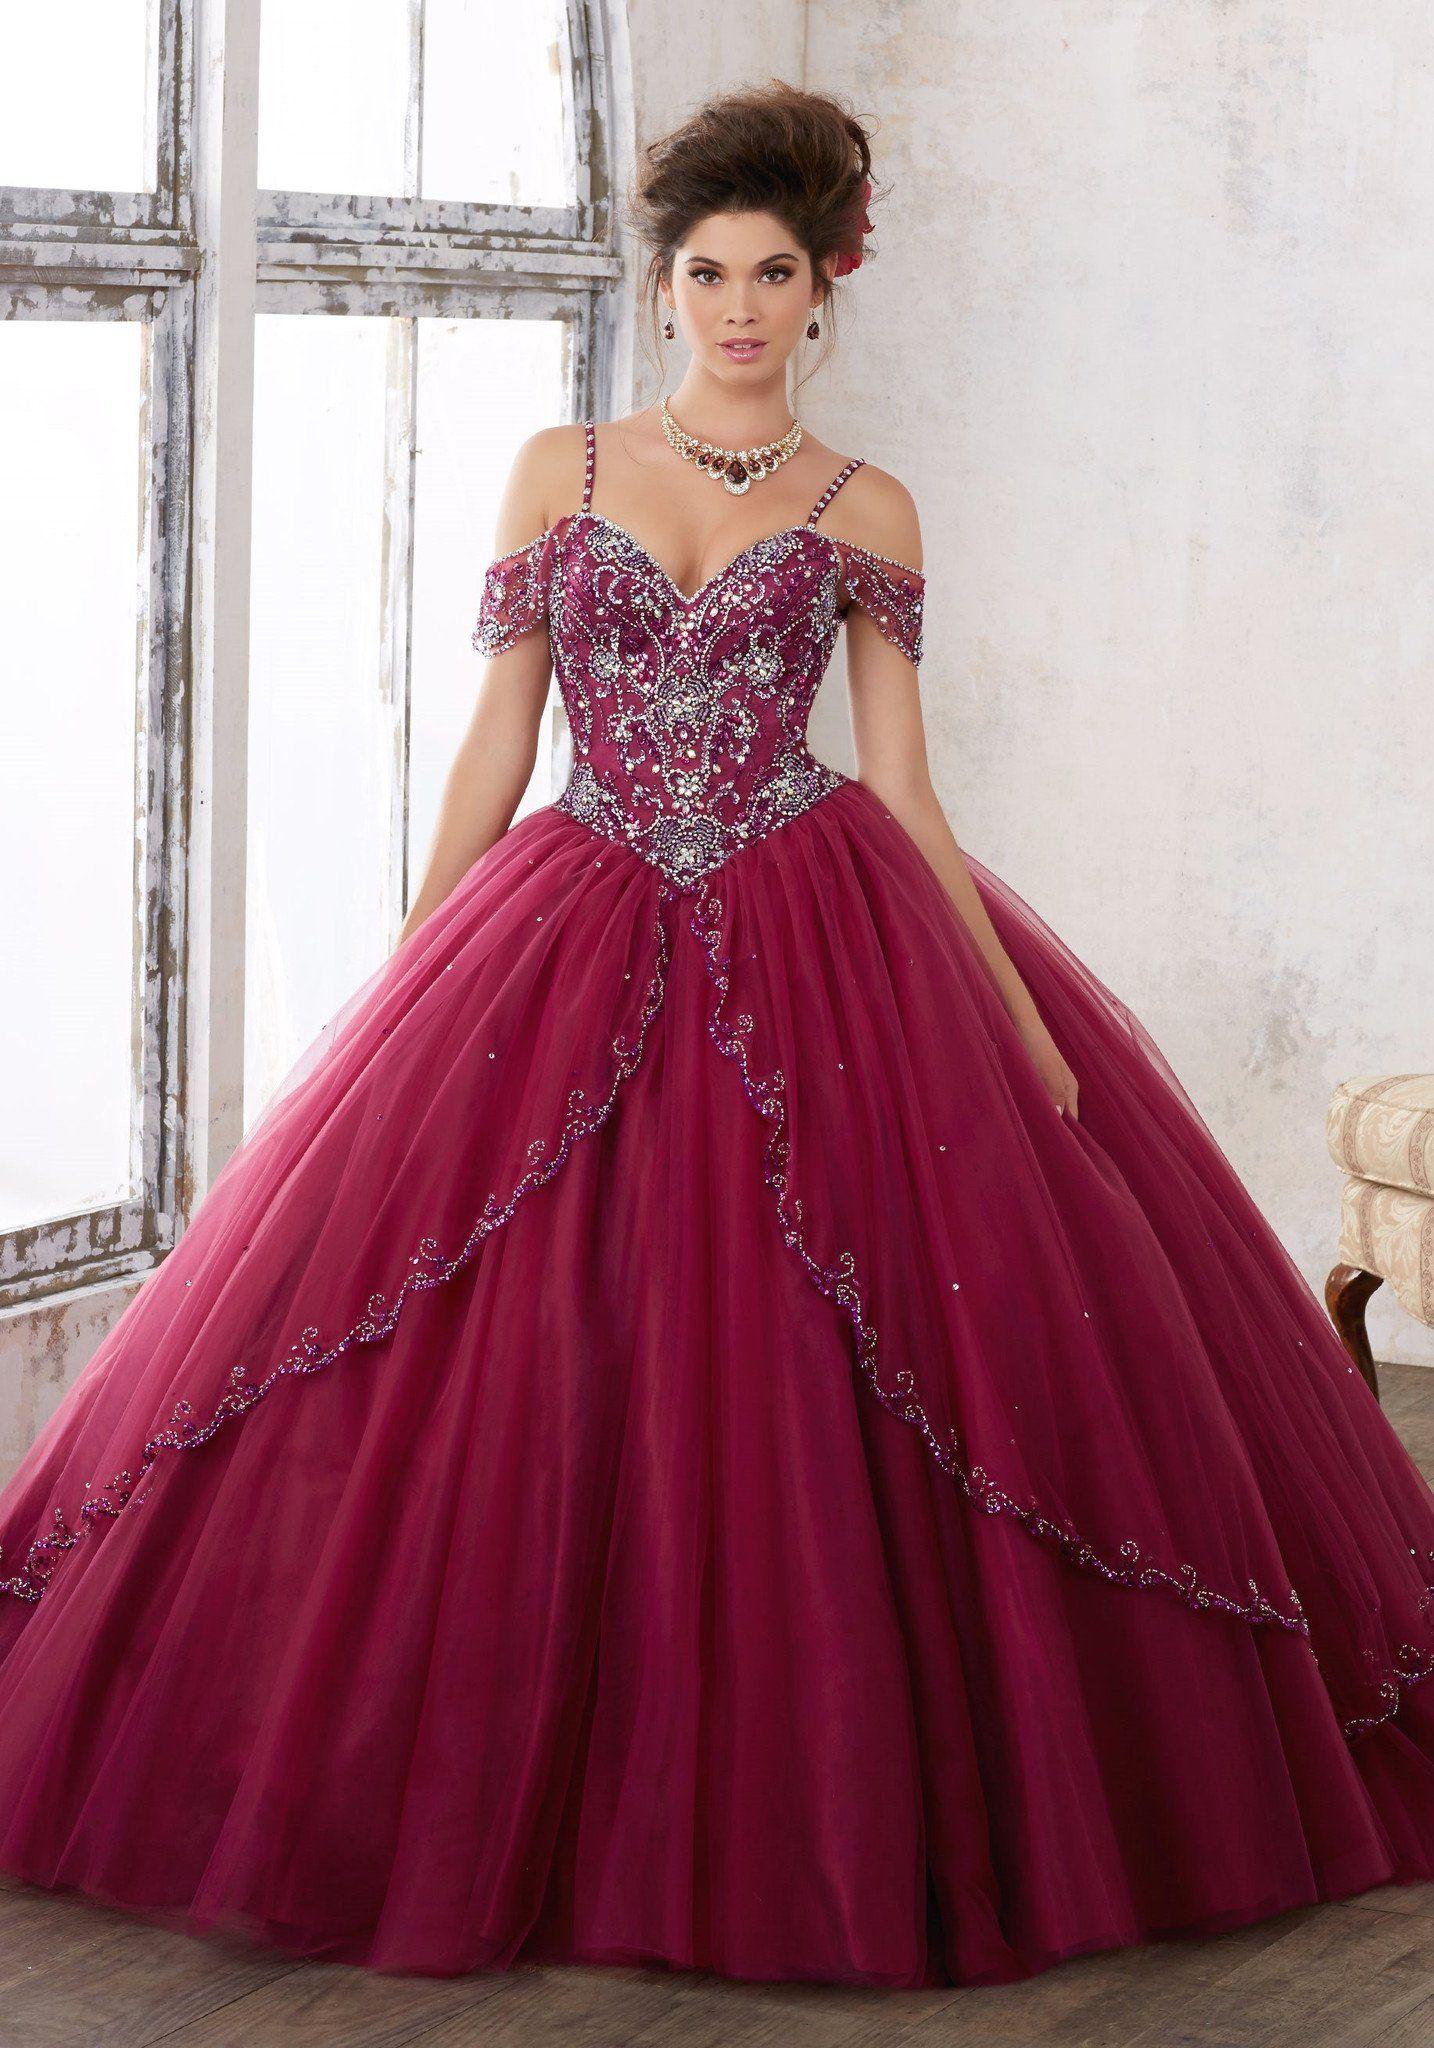 00d1071120 Beaded Off Shoulder Quinceanera Dress by Mori Lee Vizcaya 89135 ...